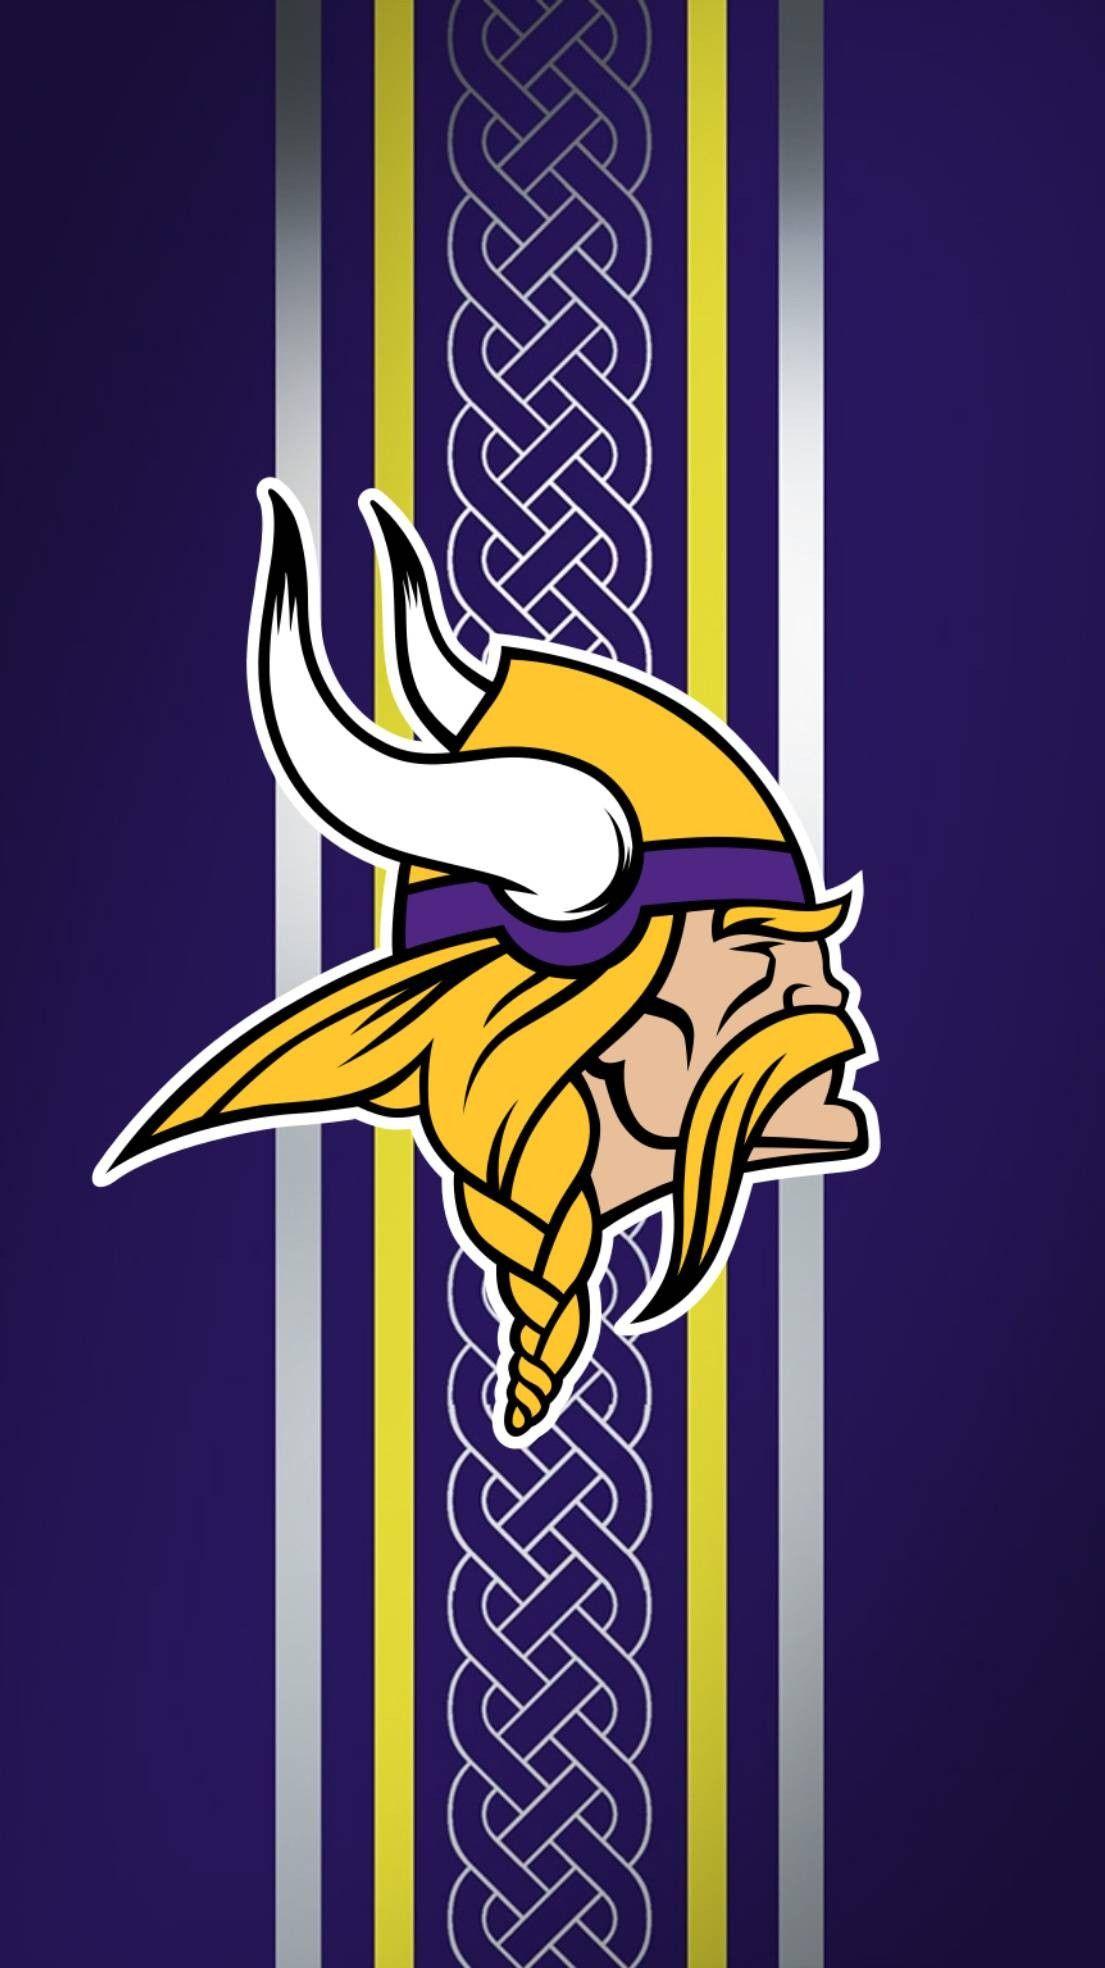 Pin By Elek A3 On Minnesota Vikings Minnesota Vikings Wallpaper Minnesota Vikings Minnesota Vikings Football